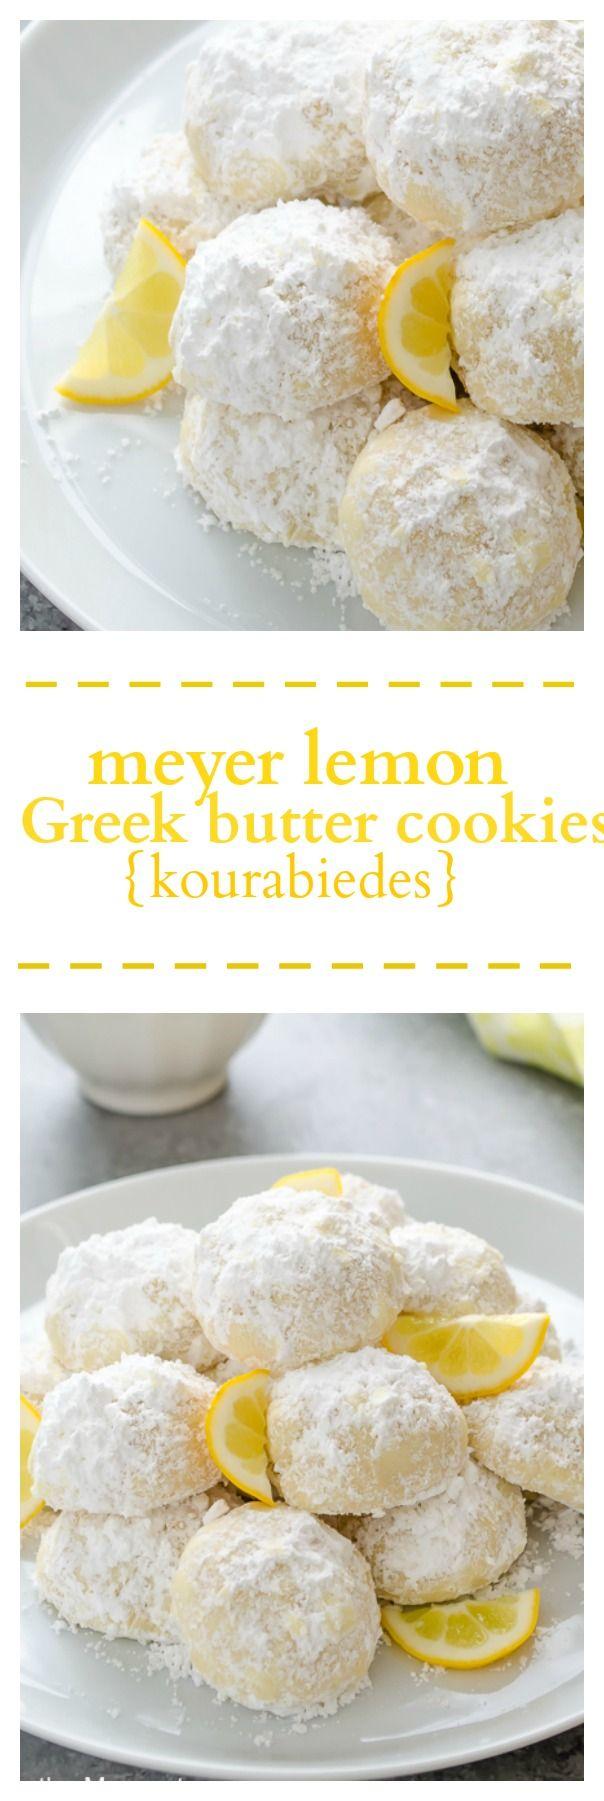 meyer-lemon-greek-butter-cookies-kourabiedes-collage-flavorthemoments.com - Flavor the Moments